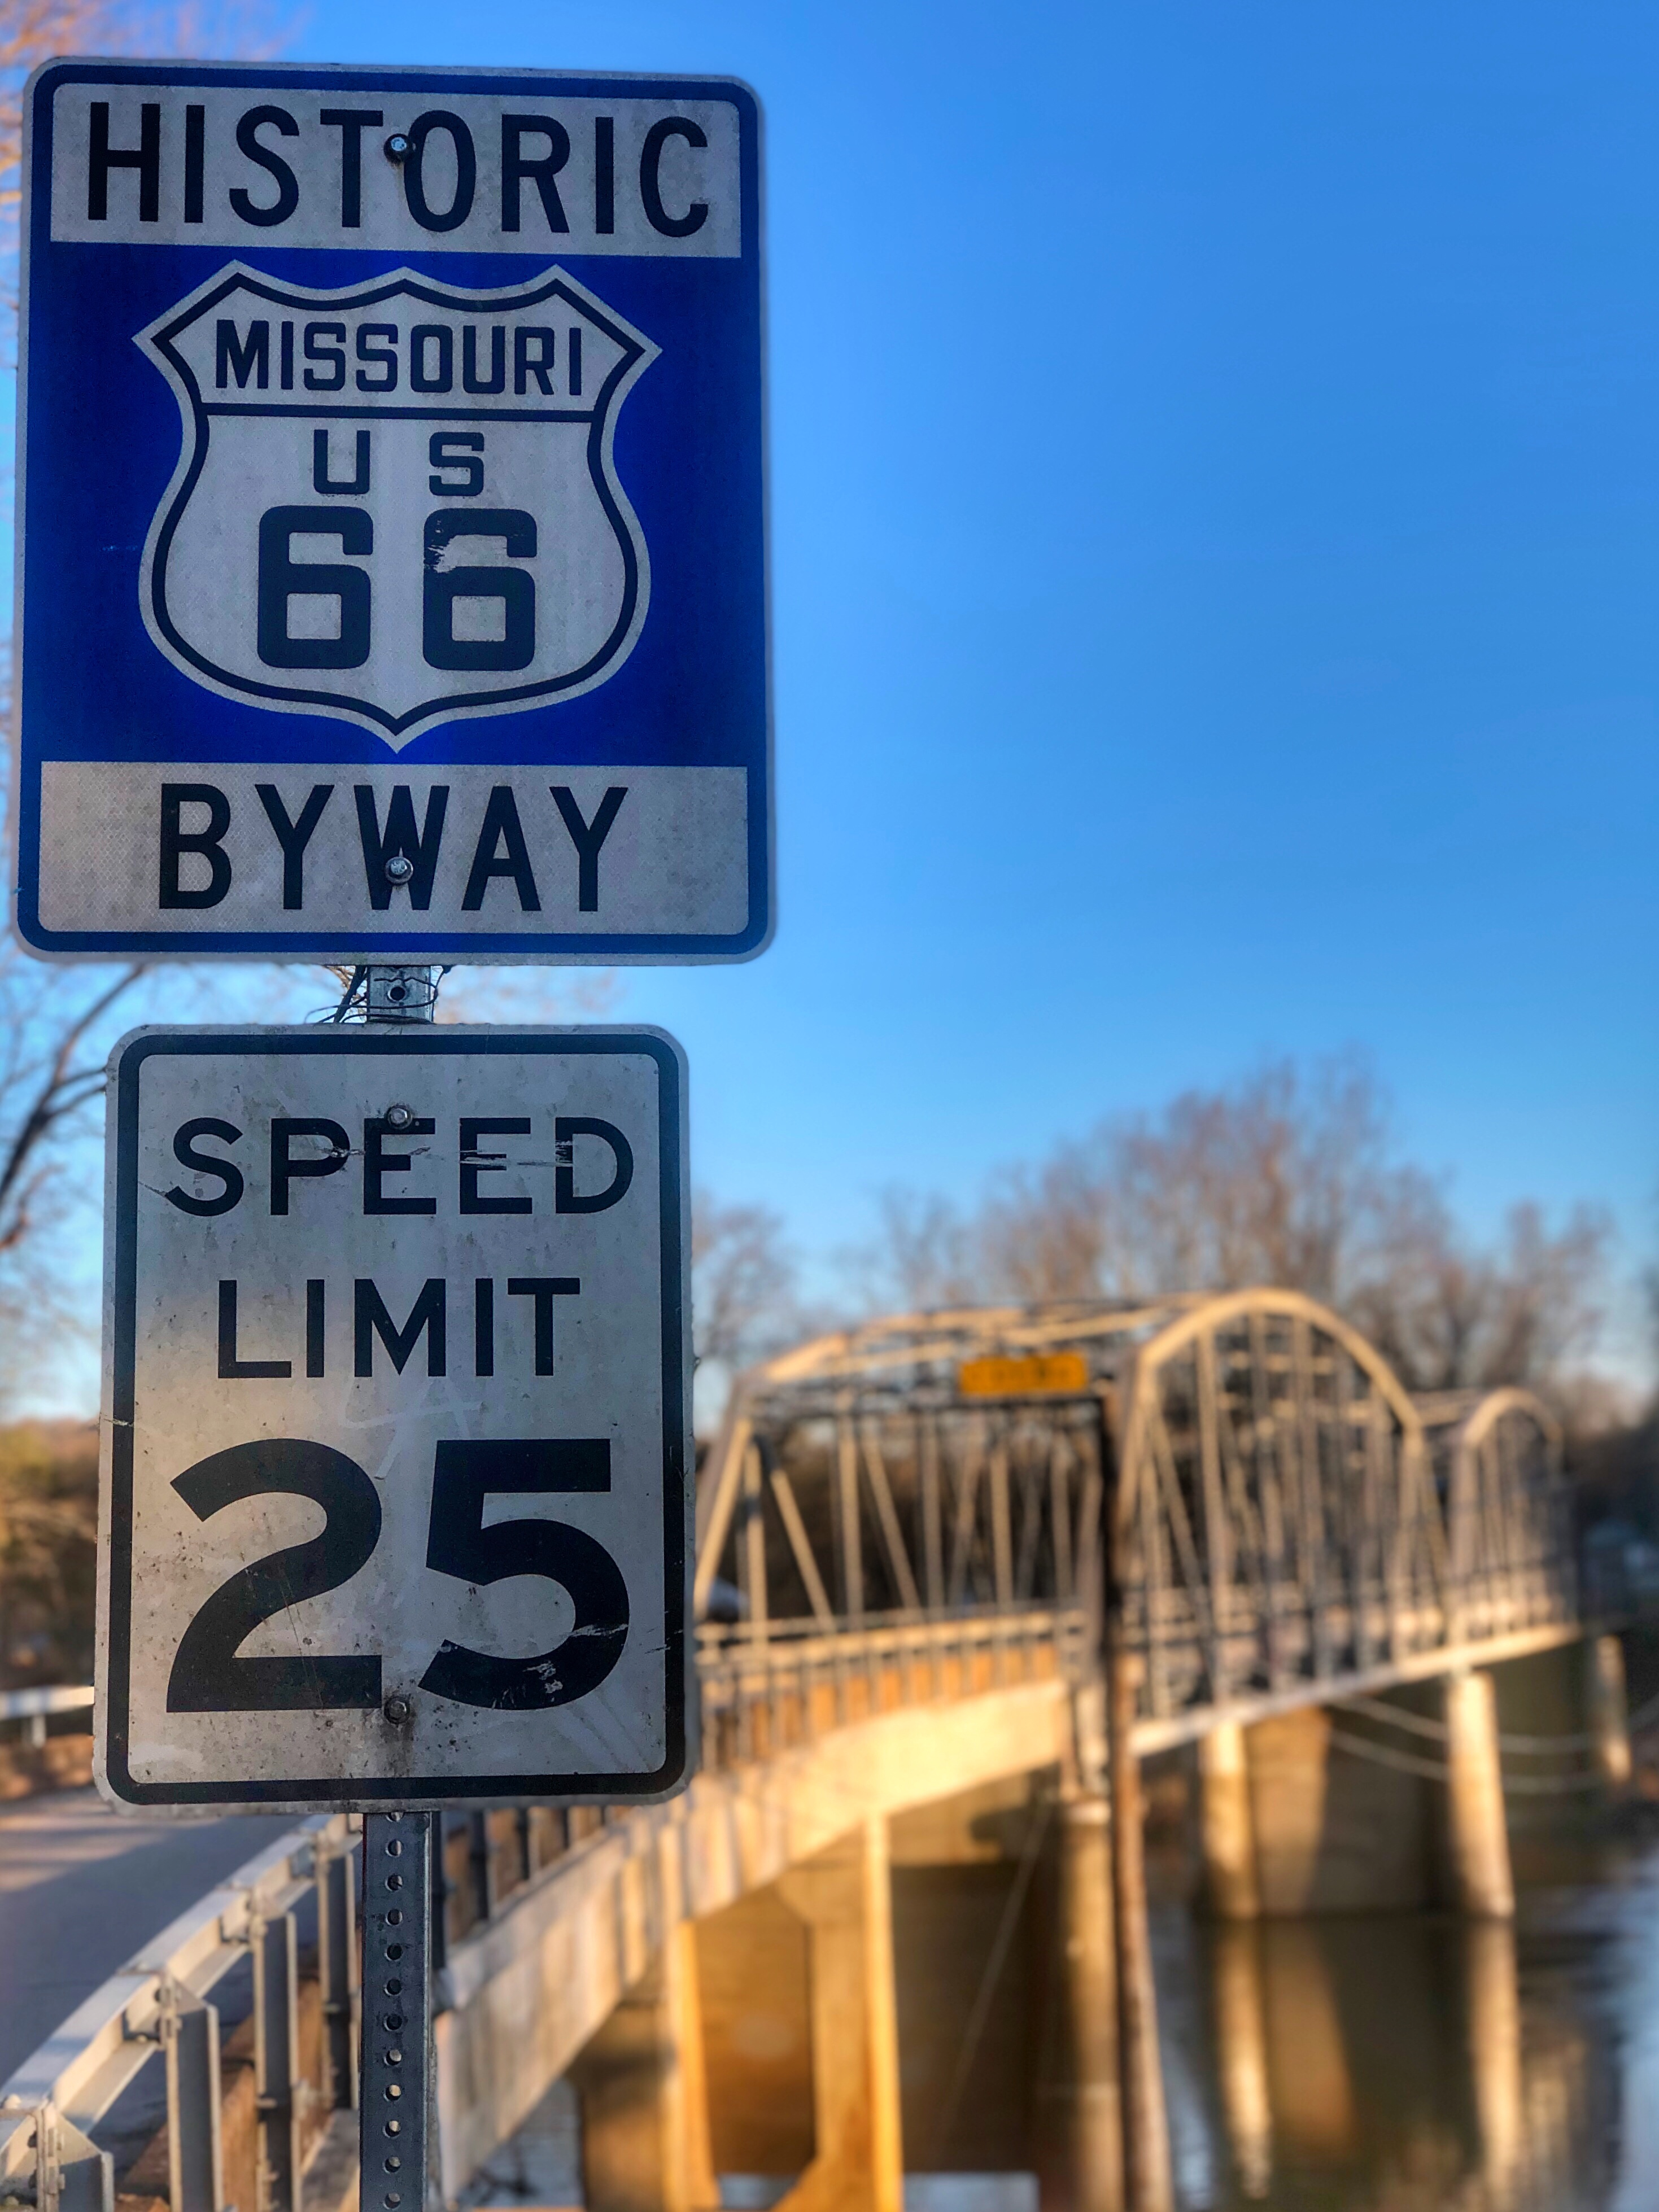 Historic 66 Pulaski County Missouri / Oh Fiddle Dee Dee